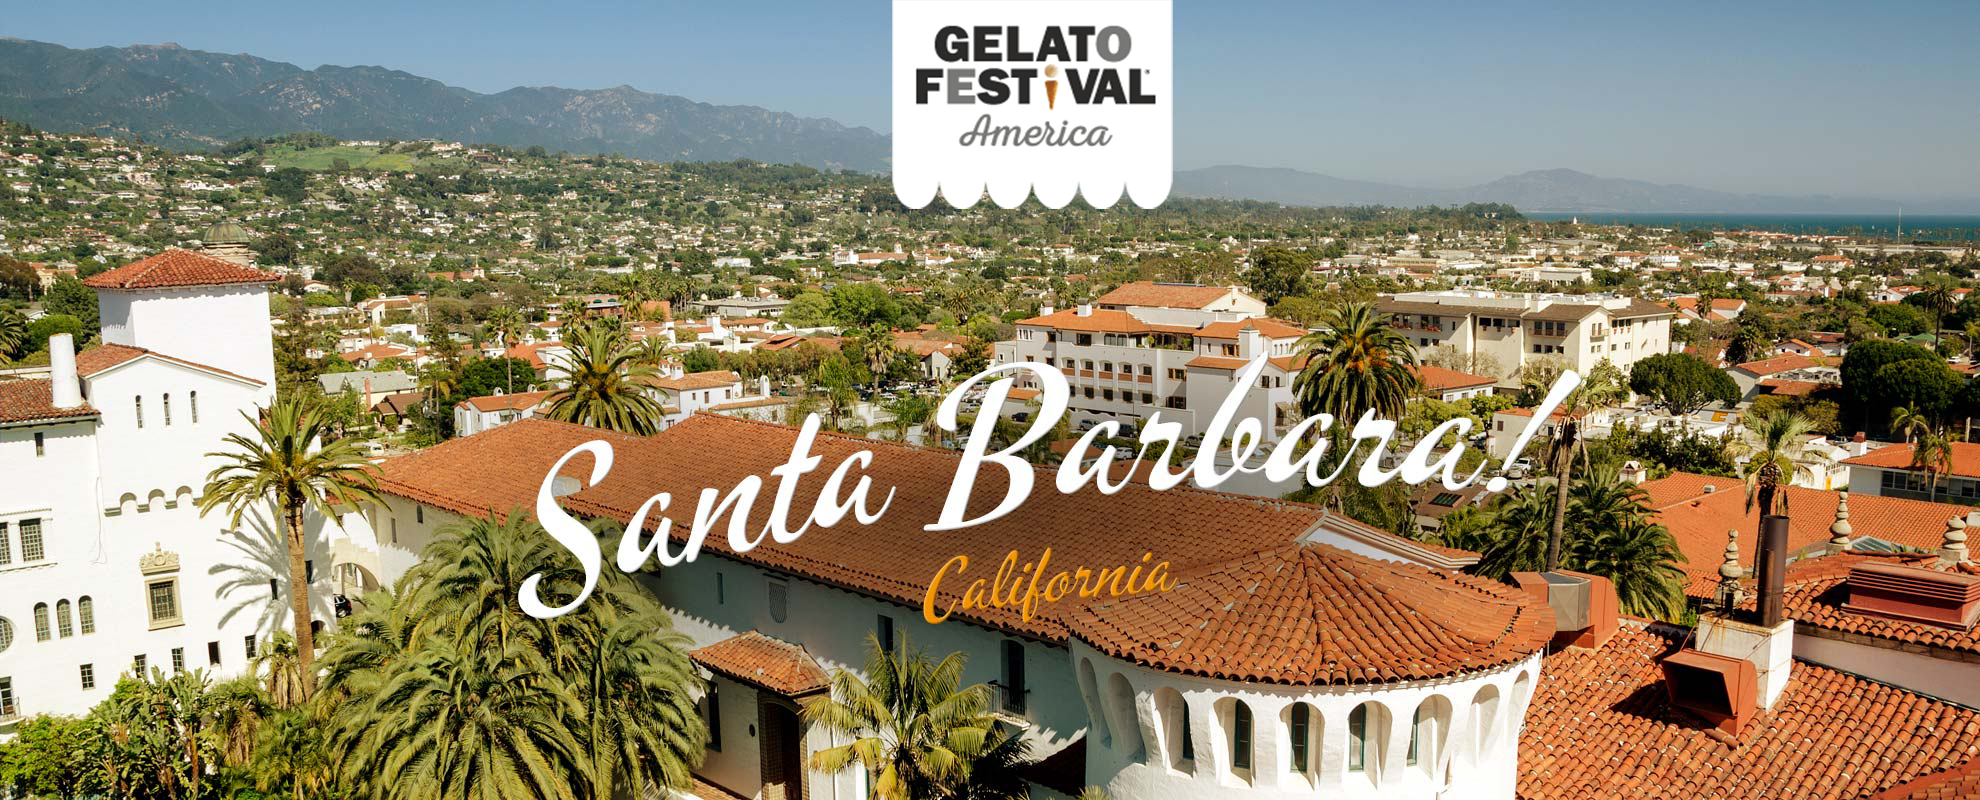 Gelato Festival Santa Barbara